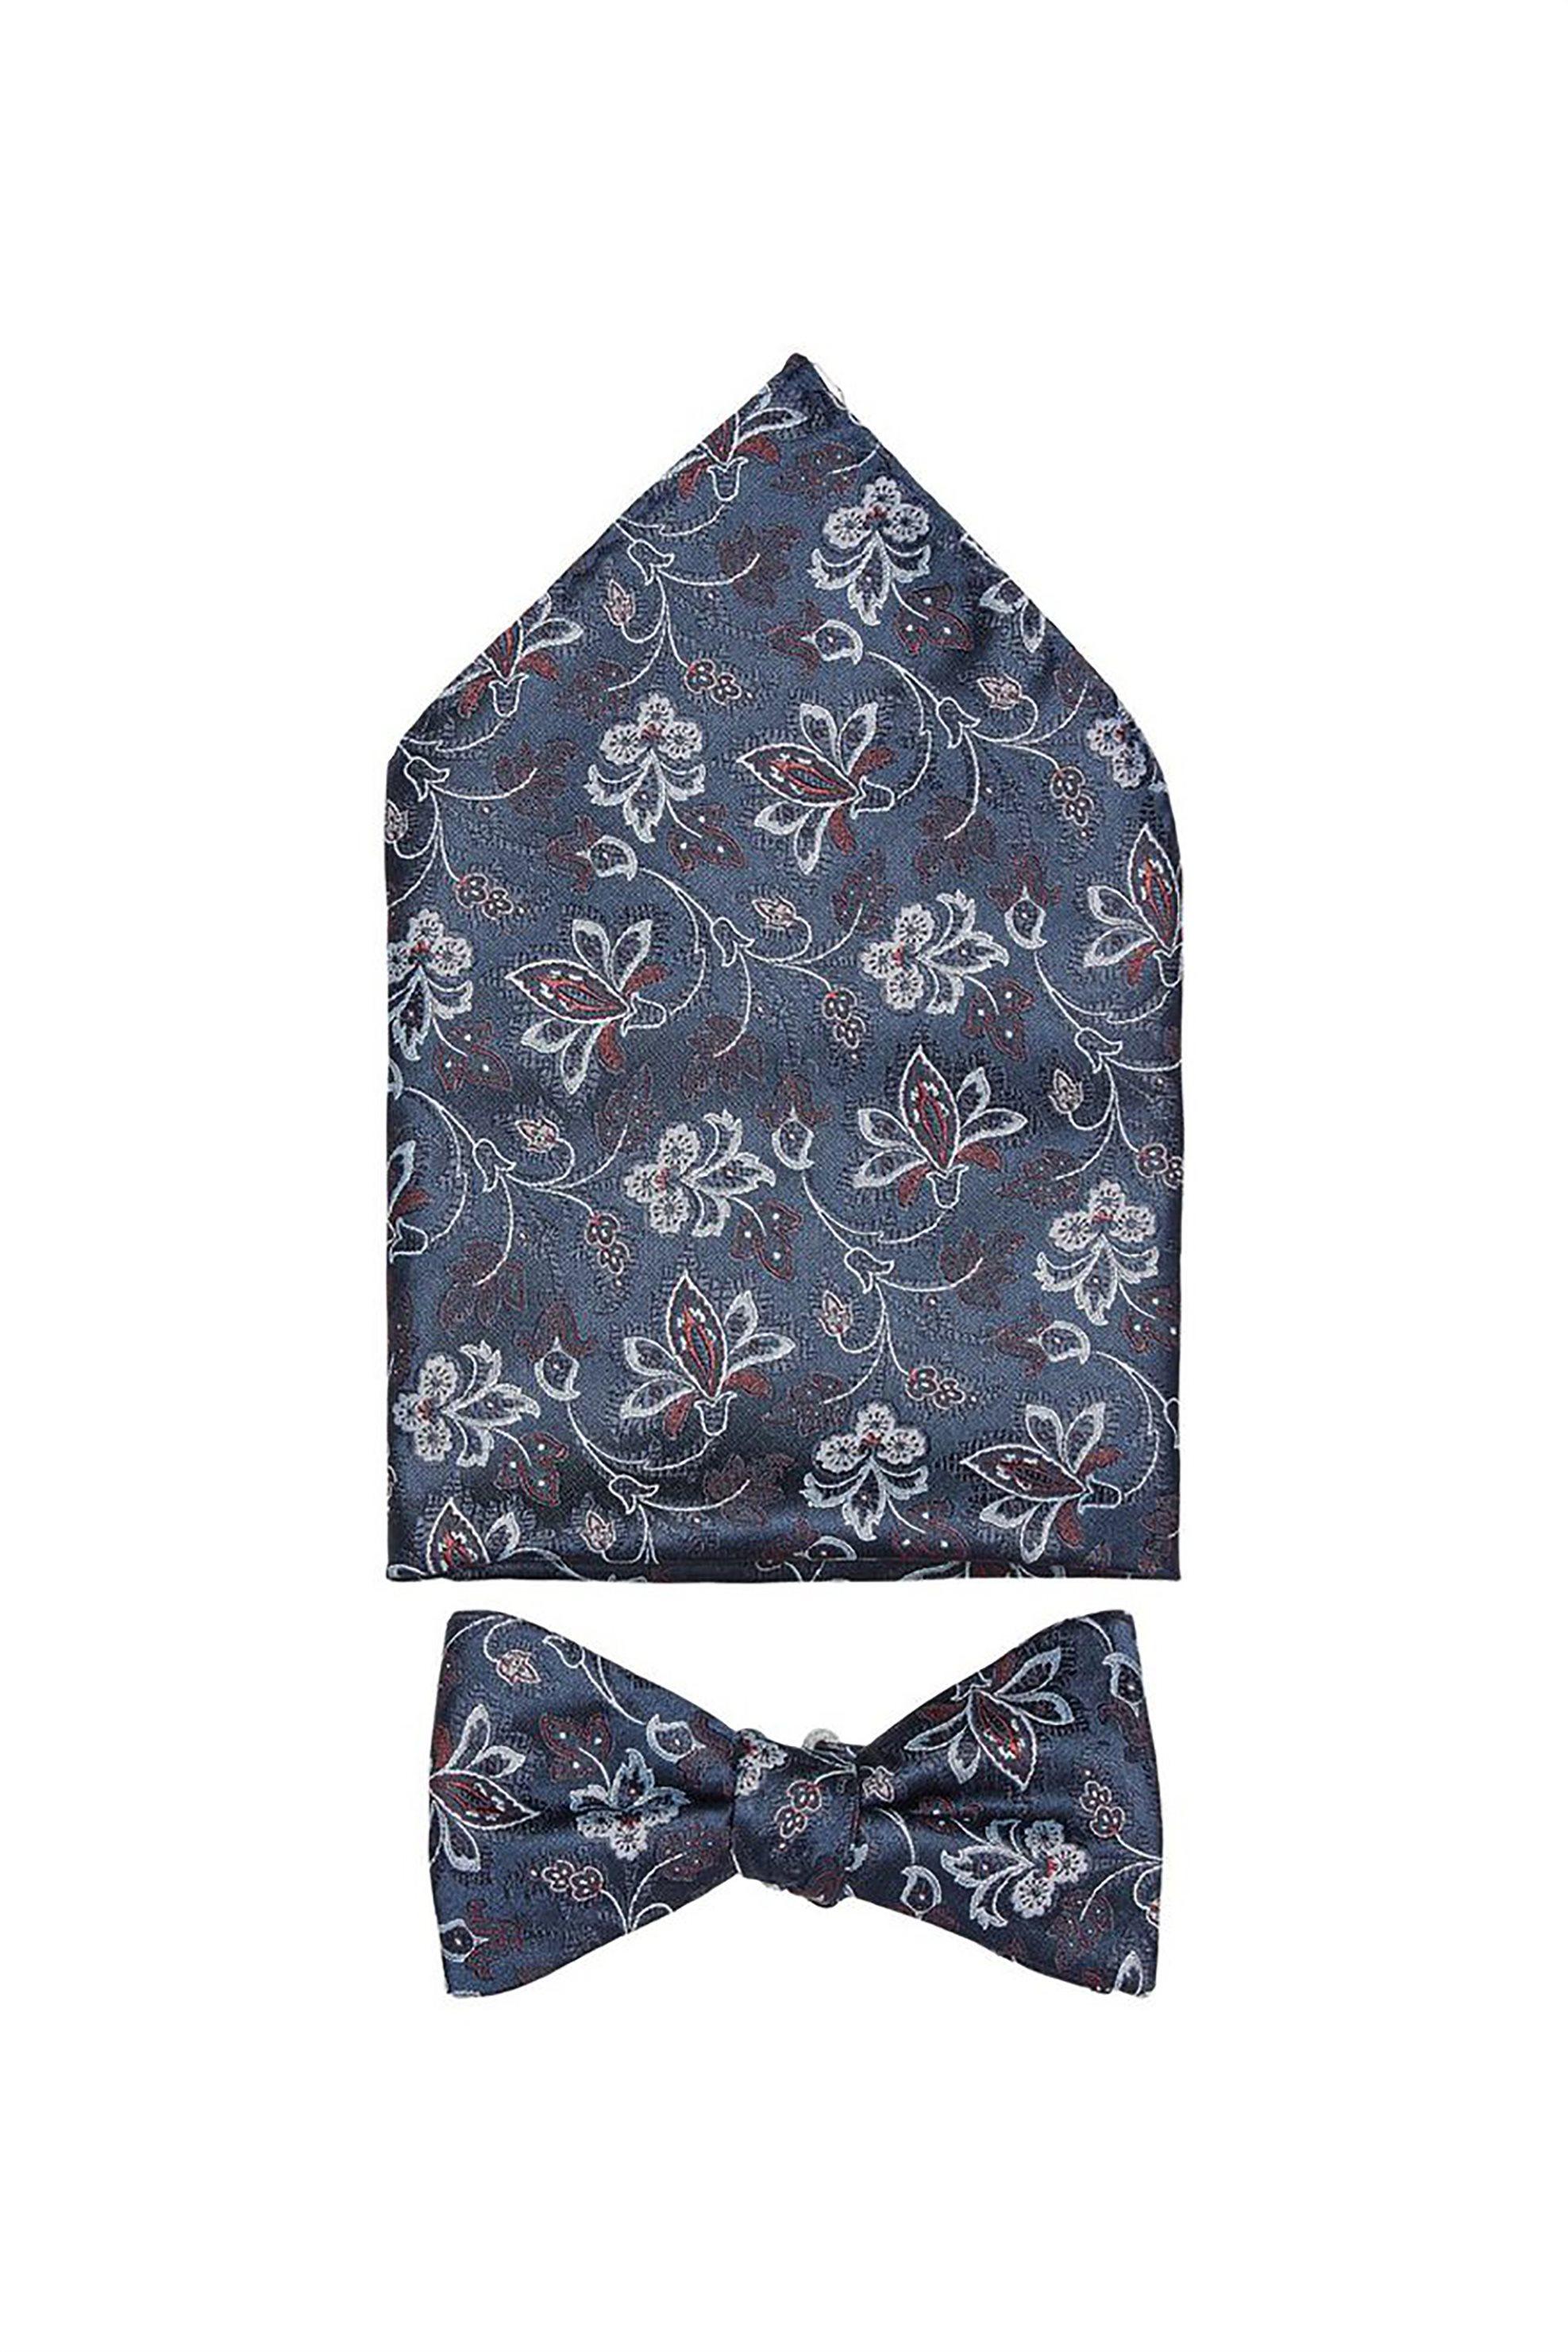 Selected ανδρική γραβάτα με print - 16069269 - Μπλε Σκούρο